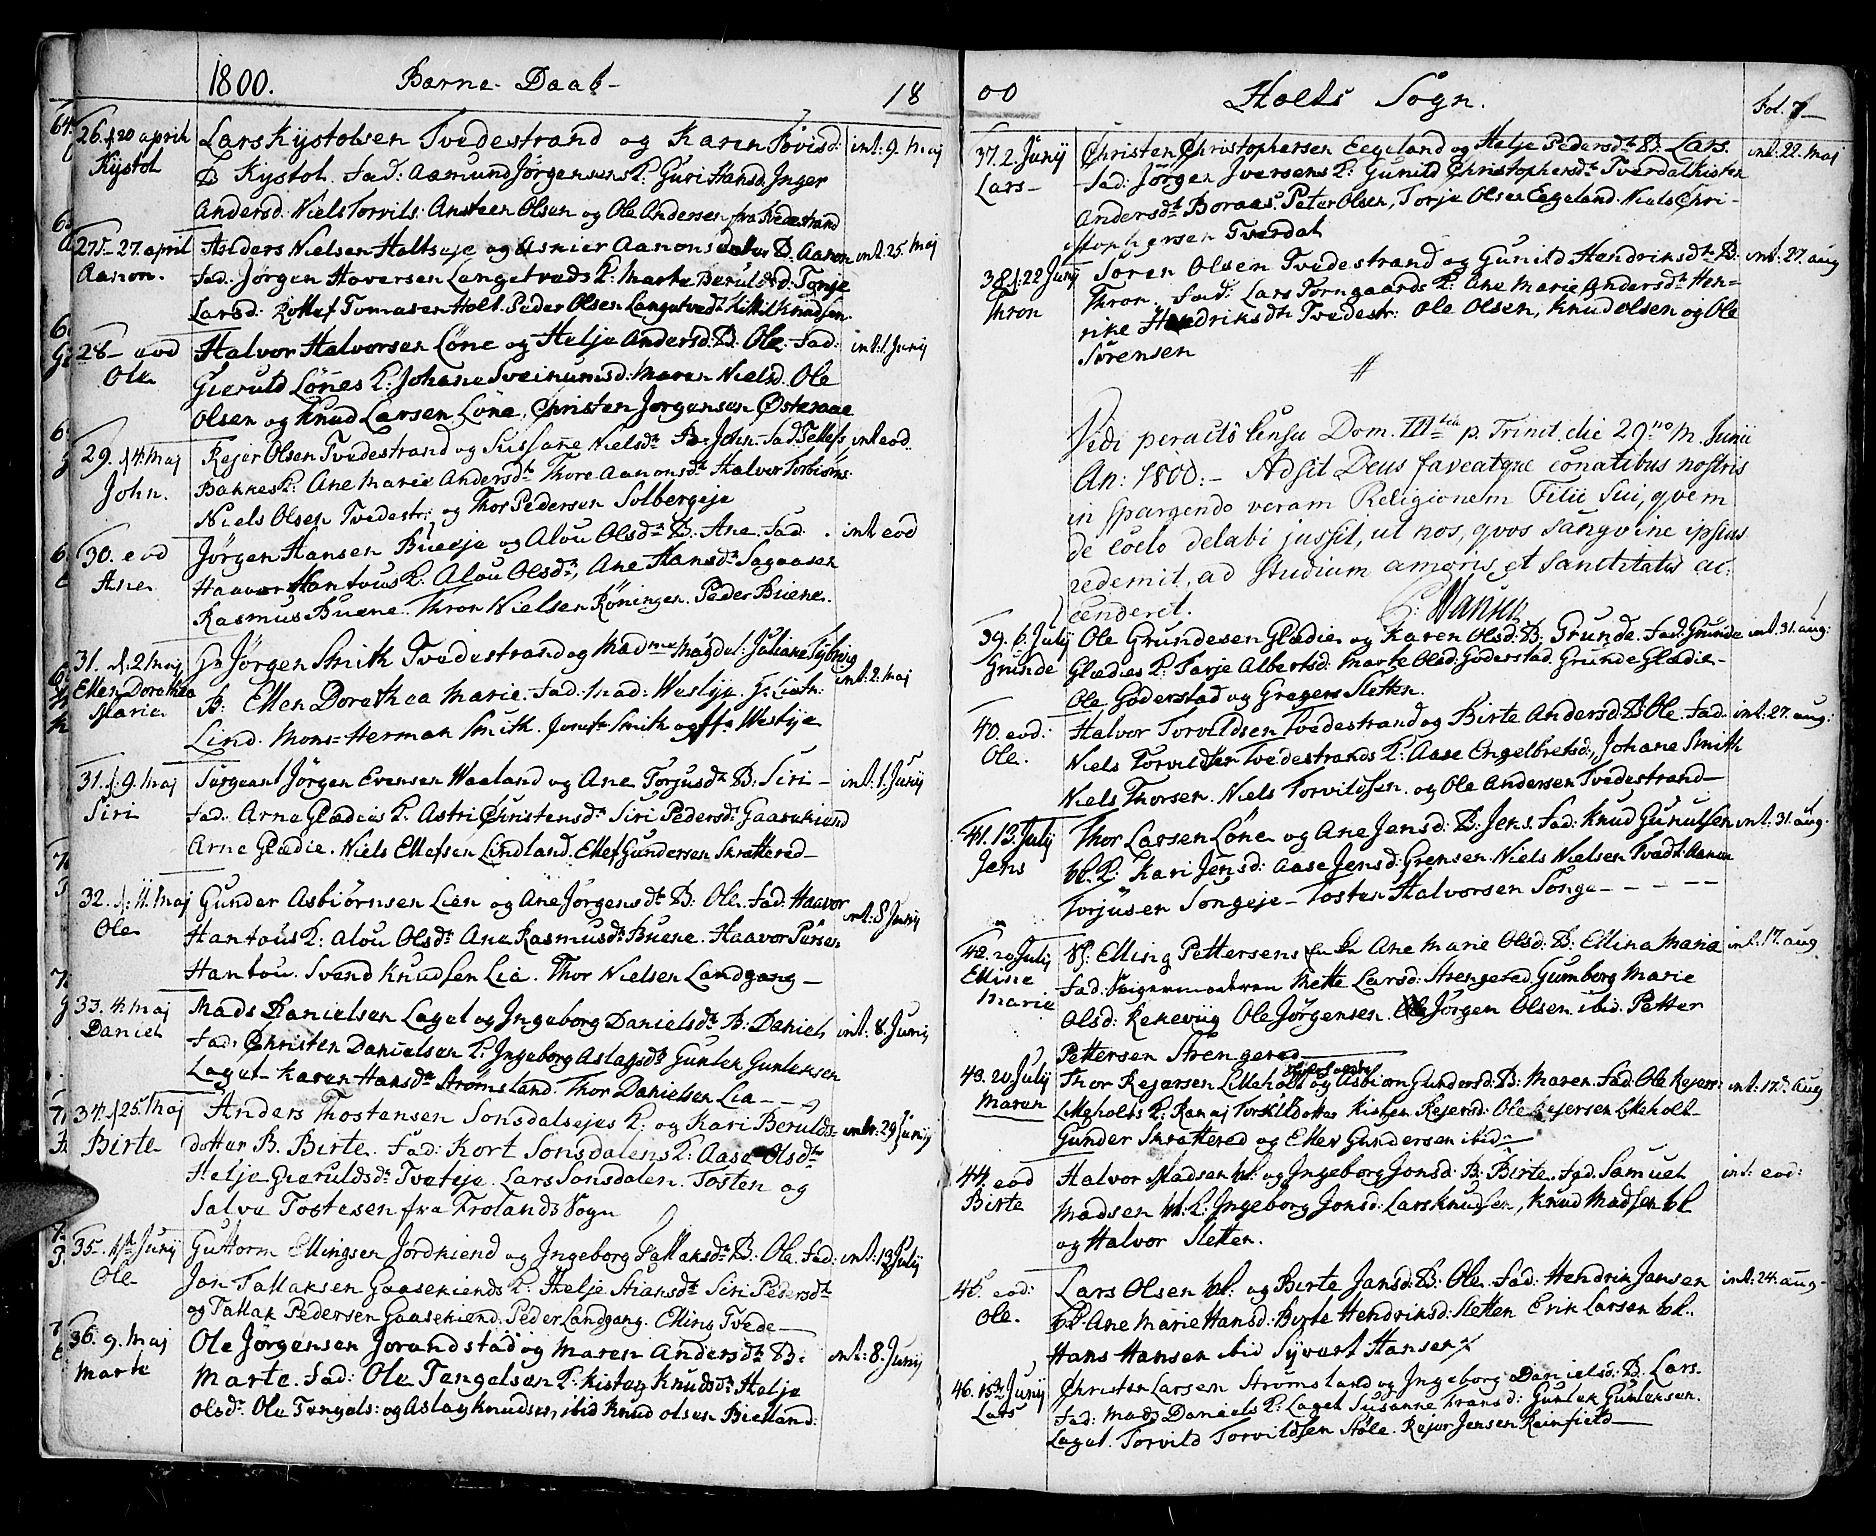 SAK, Holt sokneprestkontor, F/Fa/L0004: Ministerialbok nr. A 4, 1799-1813, s. 7